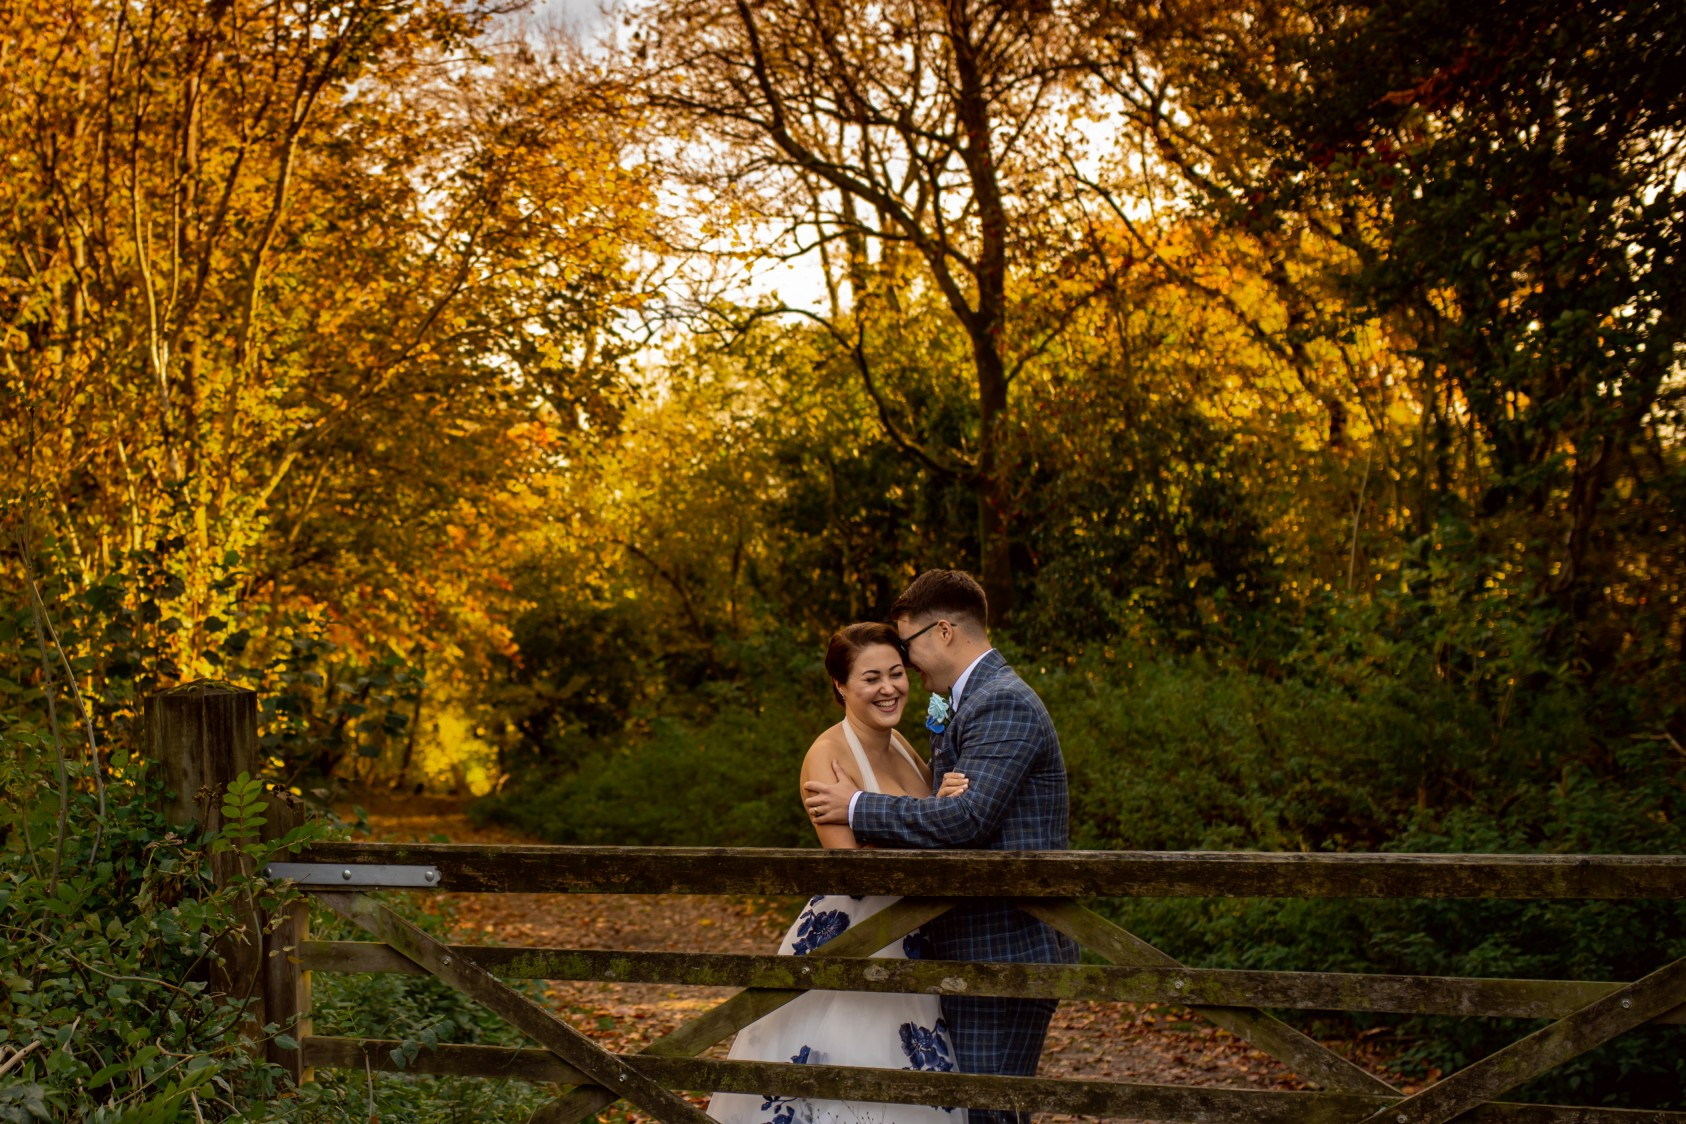 autumnal wedding photos - cotswolds wedding - creative covid wedding - artistic wedding photography